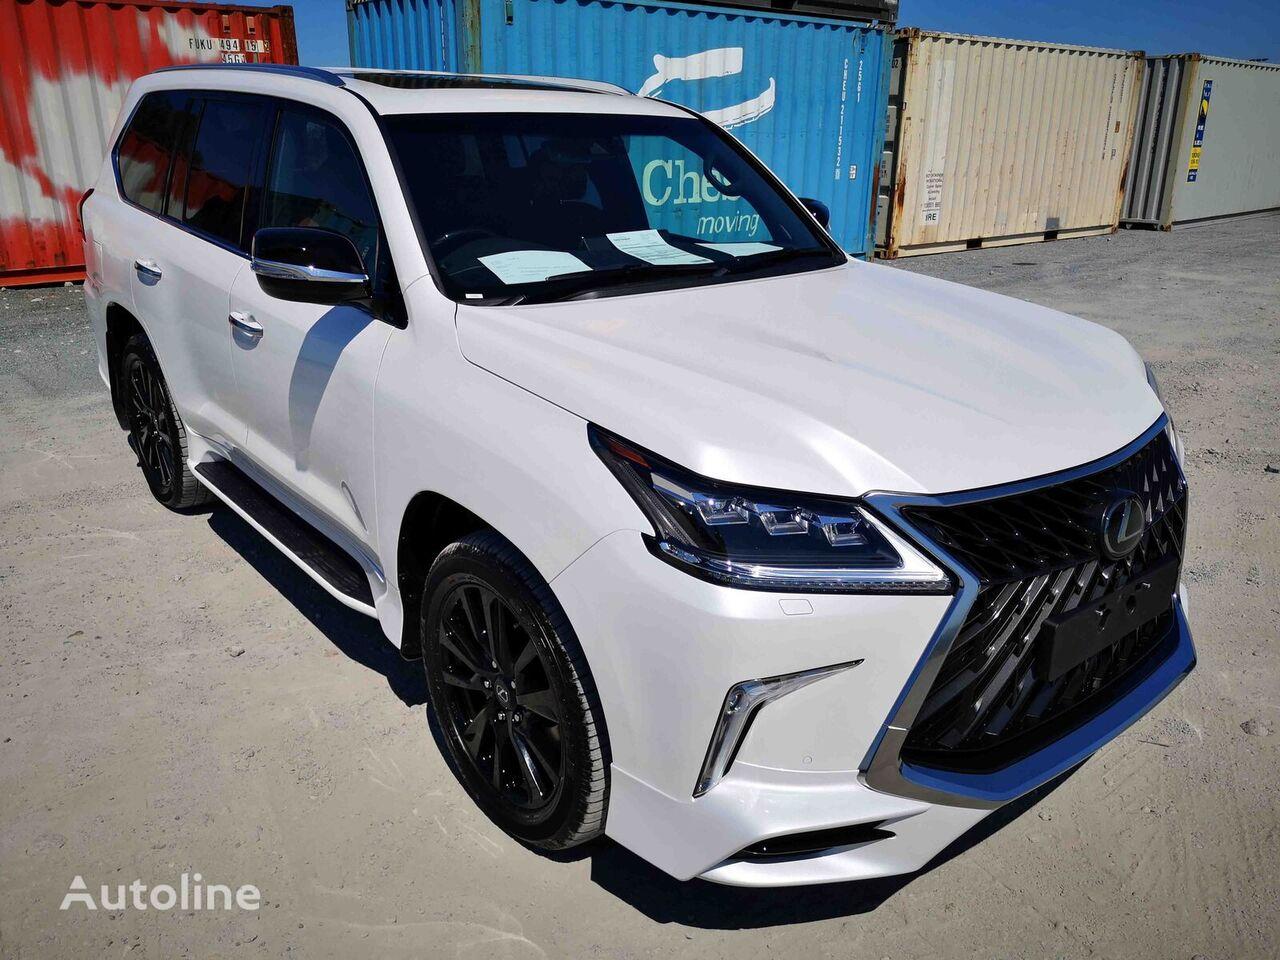 new Lexus LX 570 S EDITION - 8 SEAT SUV